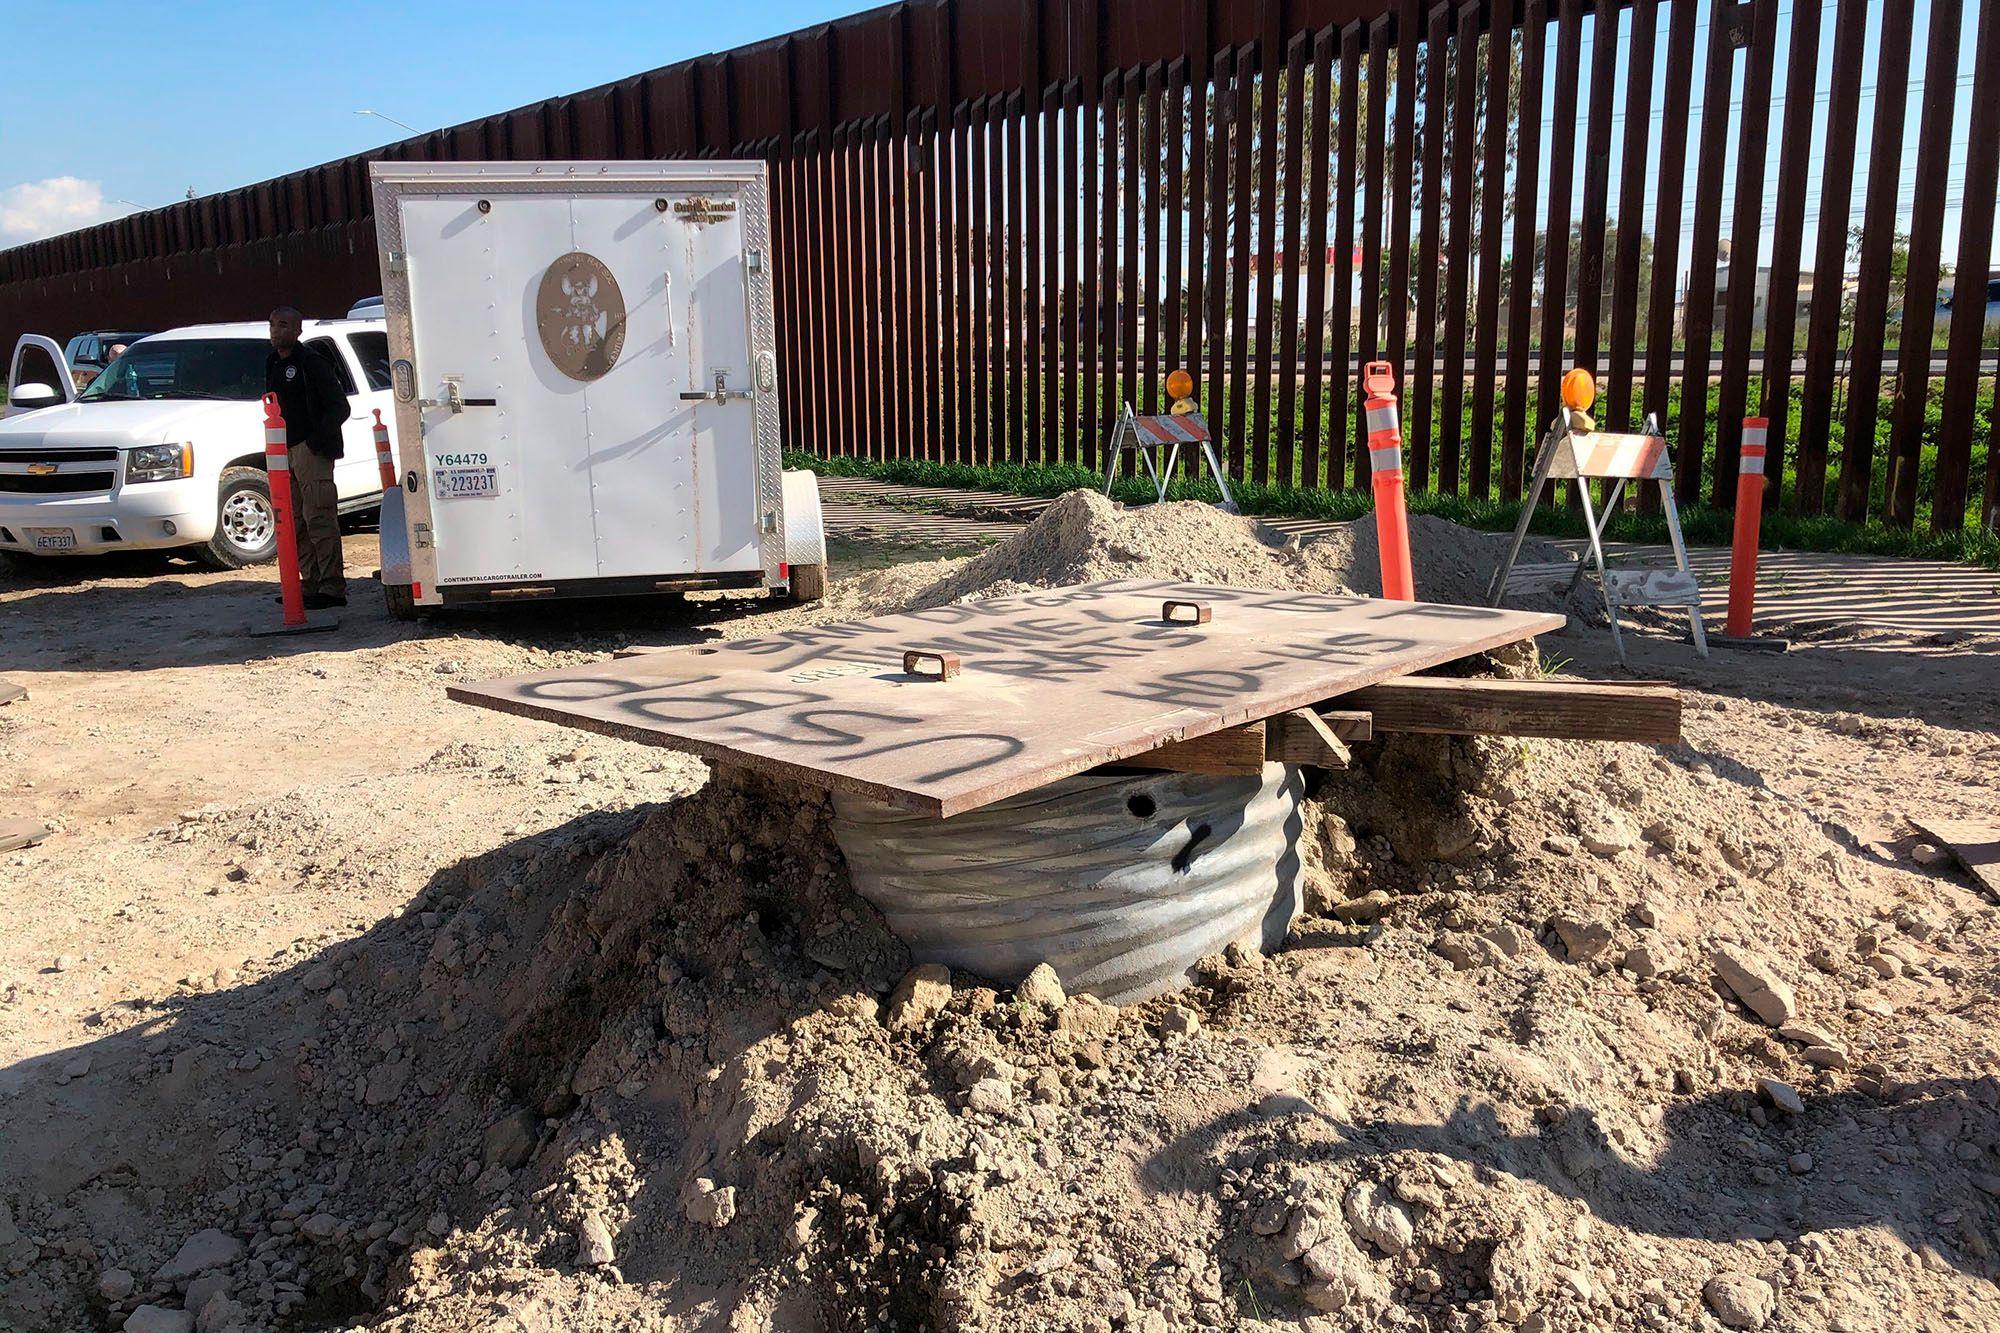 El Chapo, Ulusal Muhafız Üssünün Tam Karşısına Devasa Tünel Yaptırmış